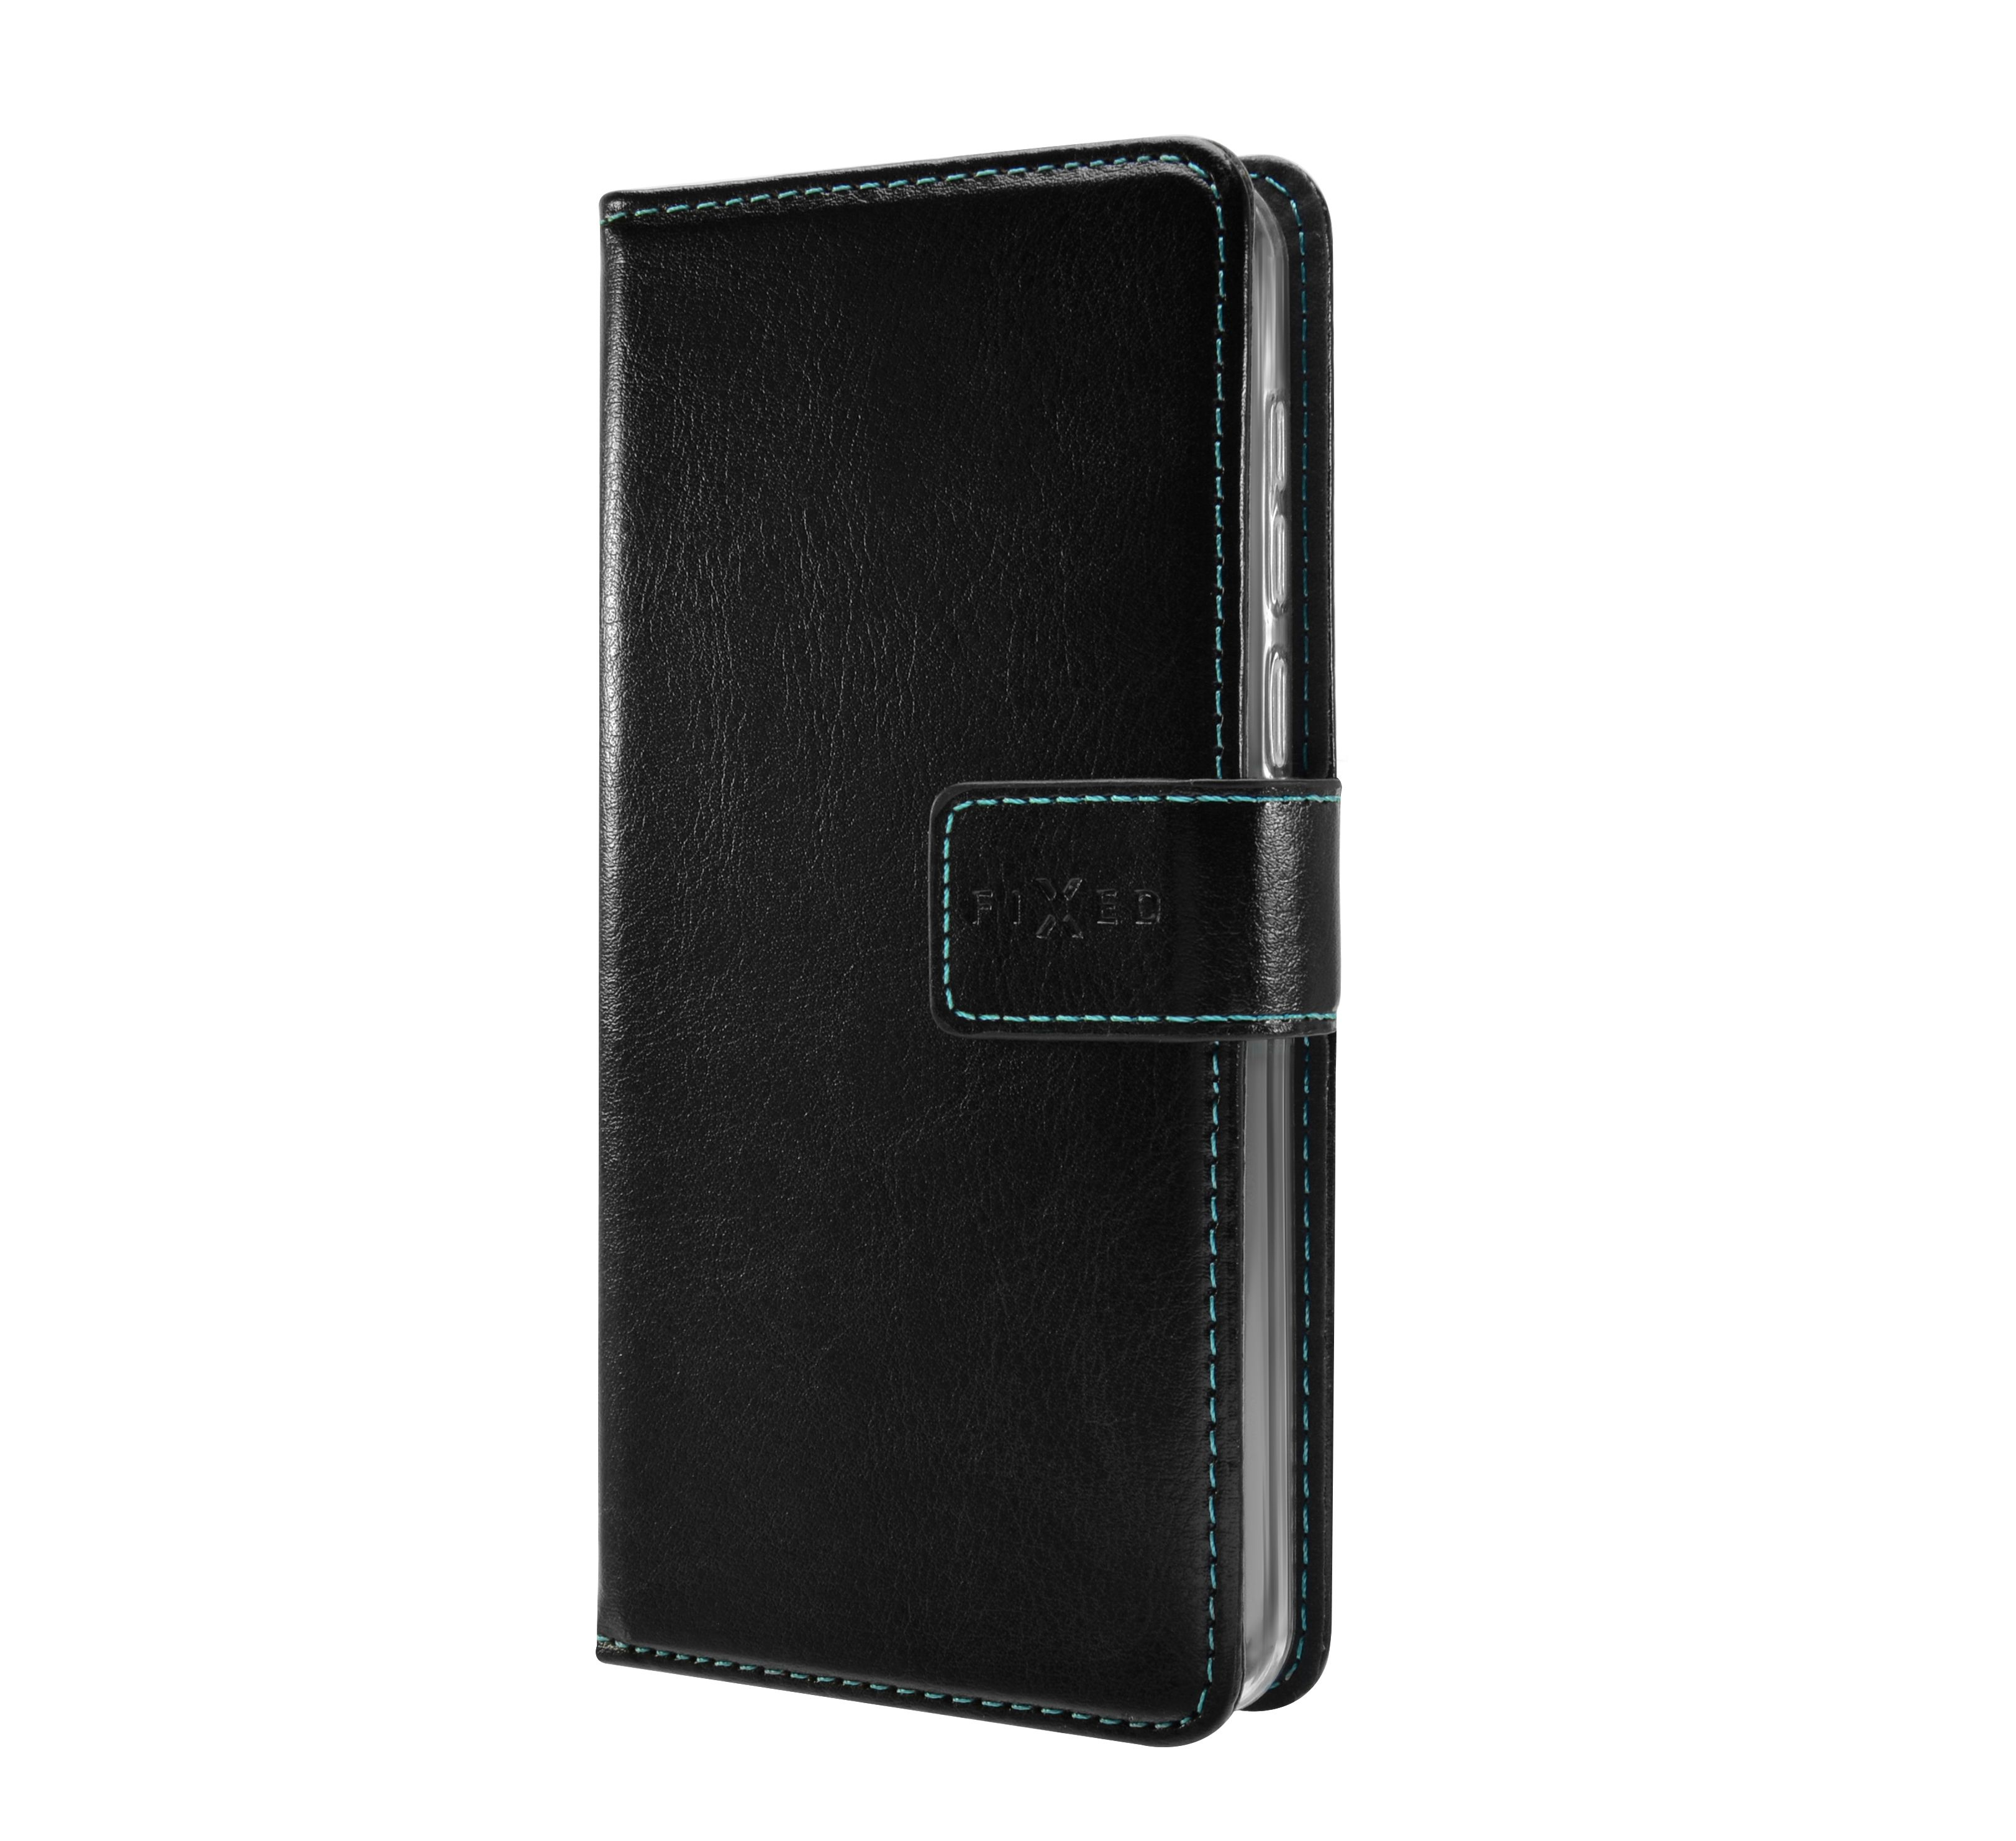 Pouzdro typu kniha FIXED Opus pro Xiaomi Redmi 3S/Redmi 3 Pro Global, černé